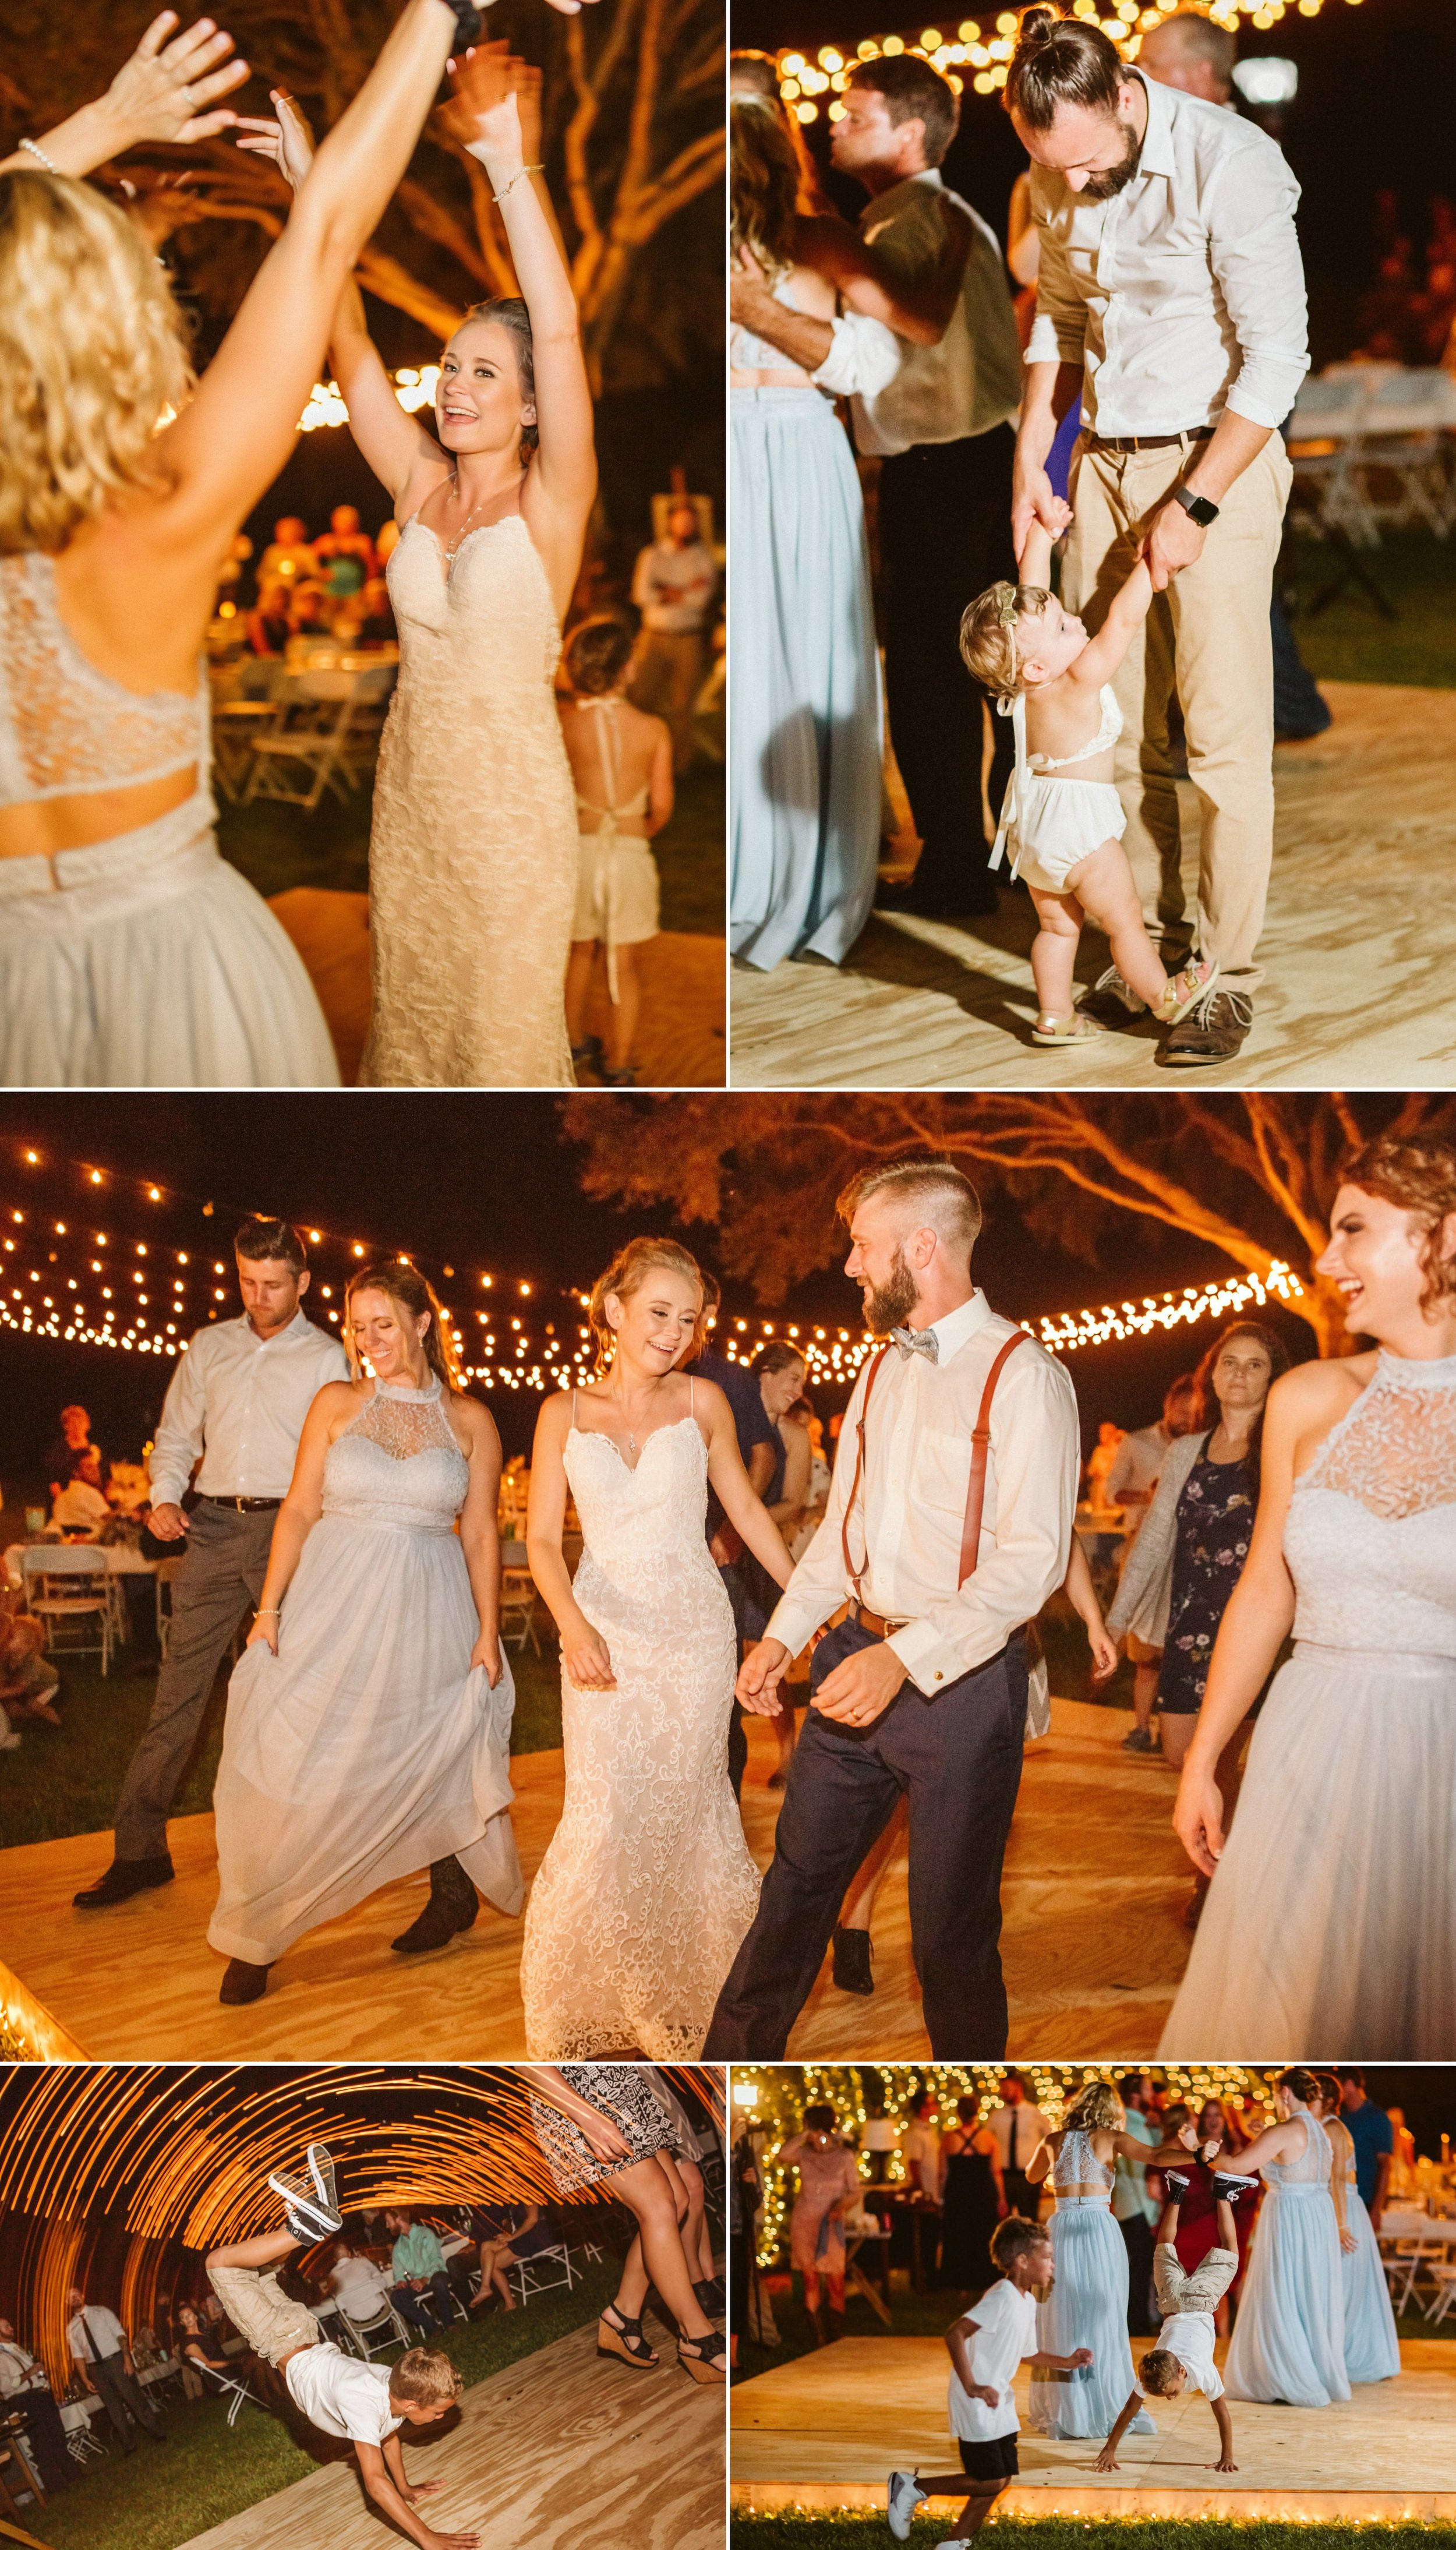 Romantic Floral Outdoor Field Chapel Wedding- Sarasota Florida- Courtney & Isaac29.jpg